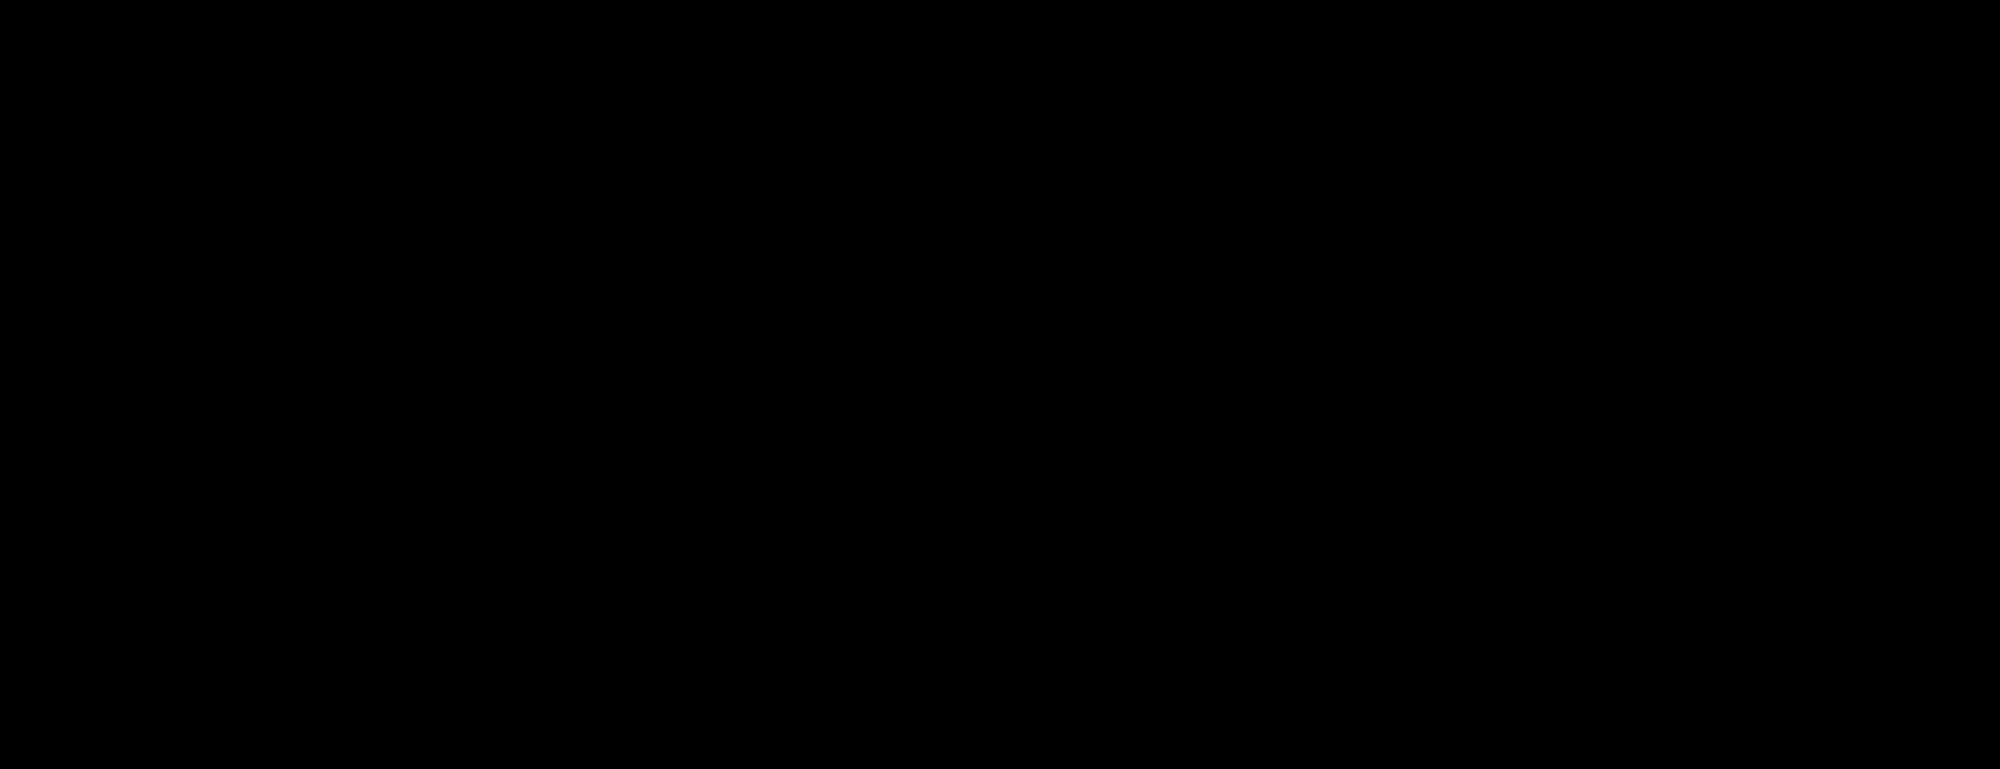 vernier caliper drawing  [ 2000 x 769 Pixel ]